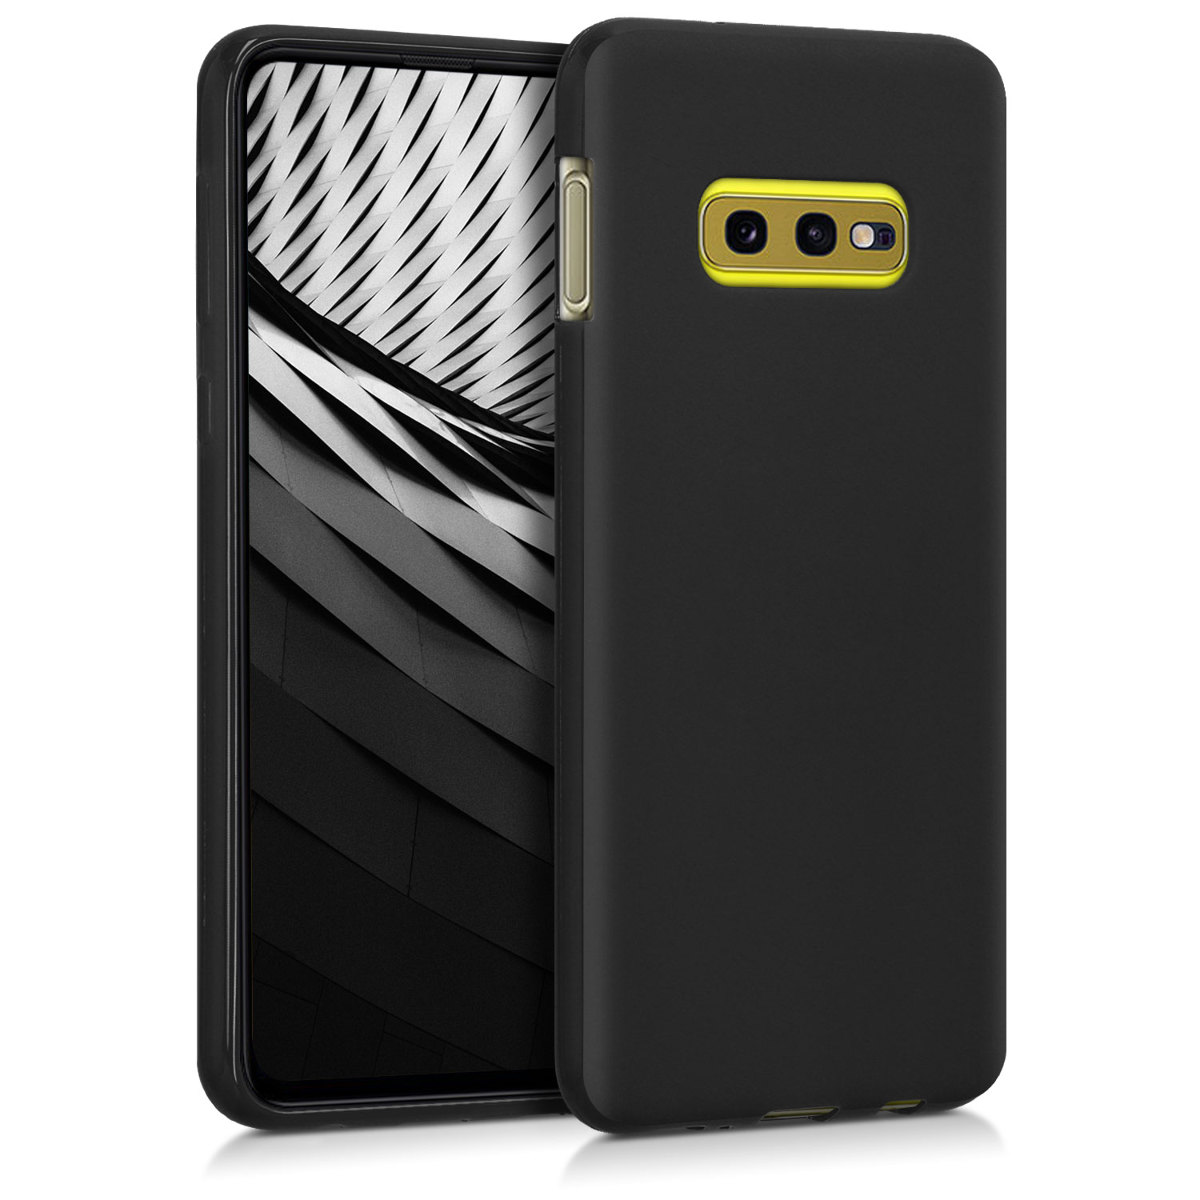 KW Θήκη Σιλικόνης Samsung Galaxy S10e - Soft Flexible Shock Absorbent Protective Phone Cover - Black Matte (47574.47)